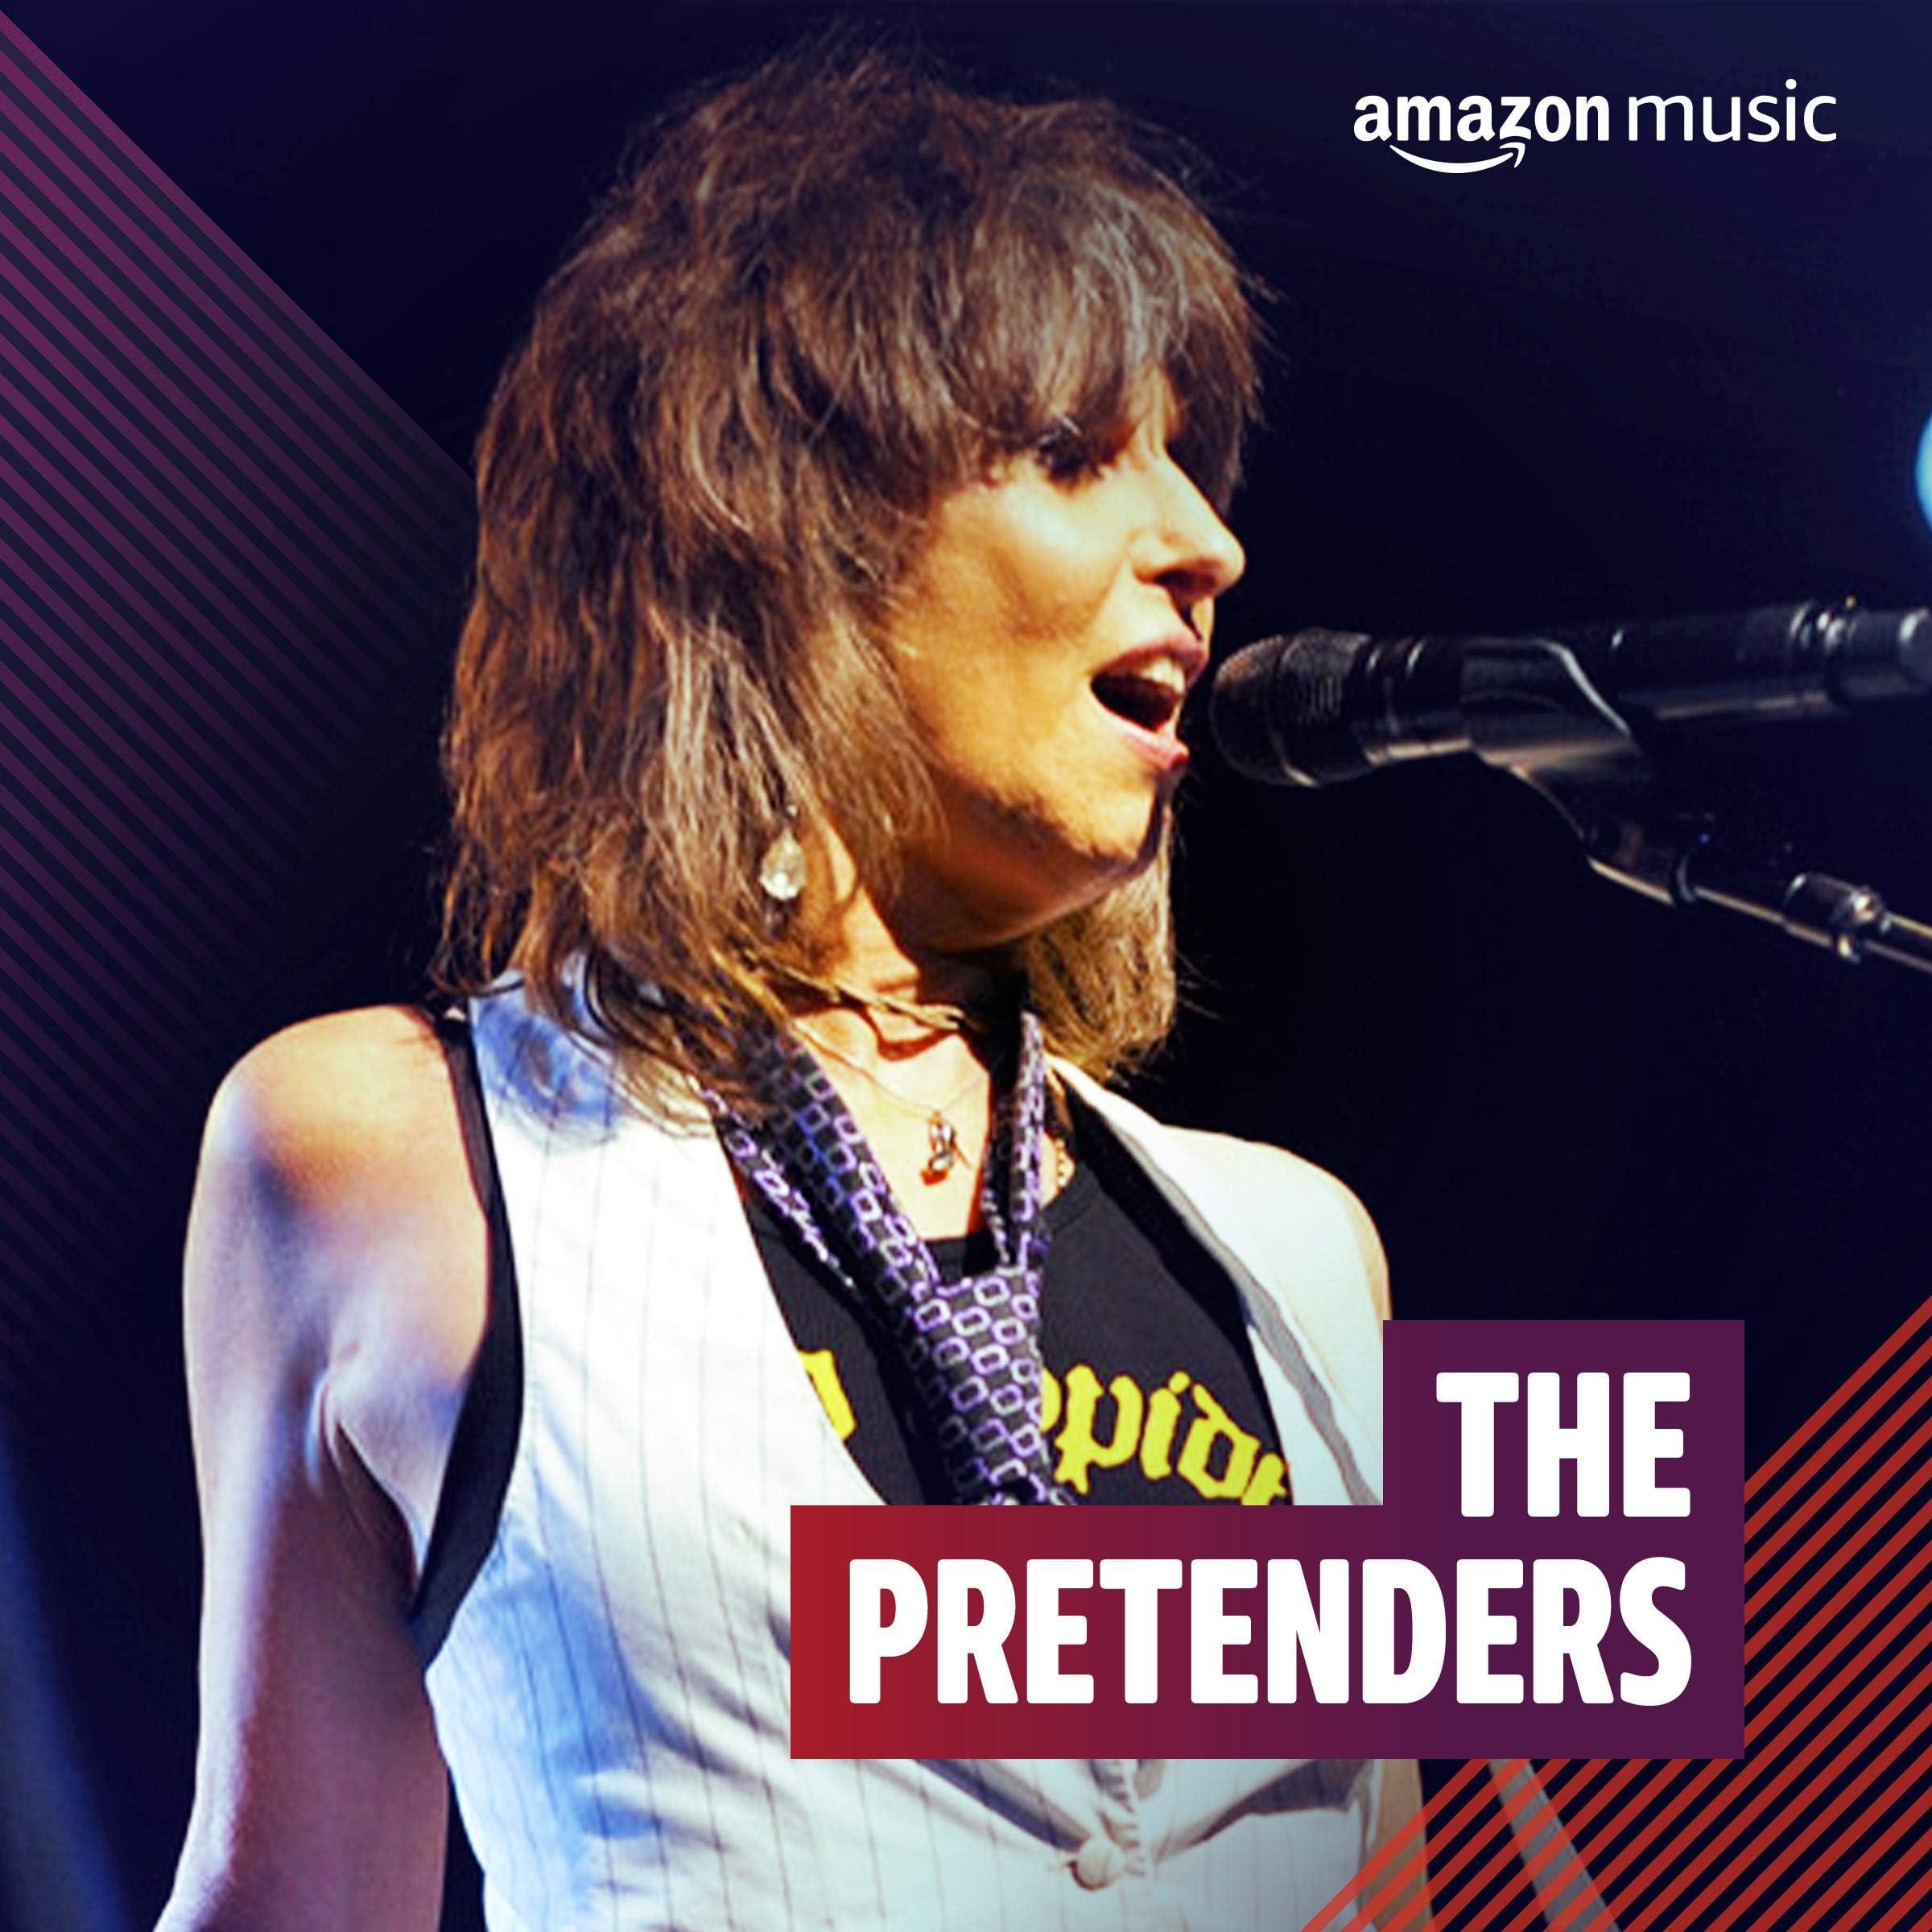 The Pretenders